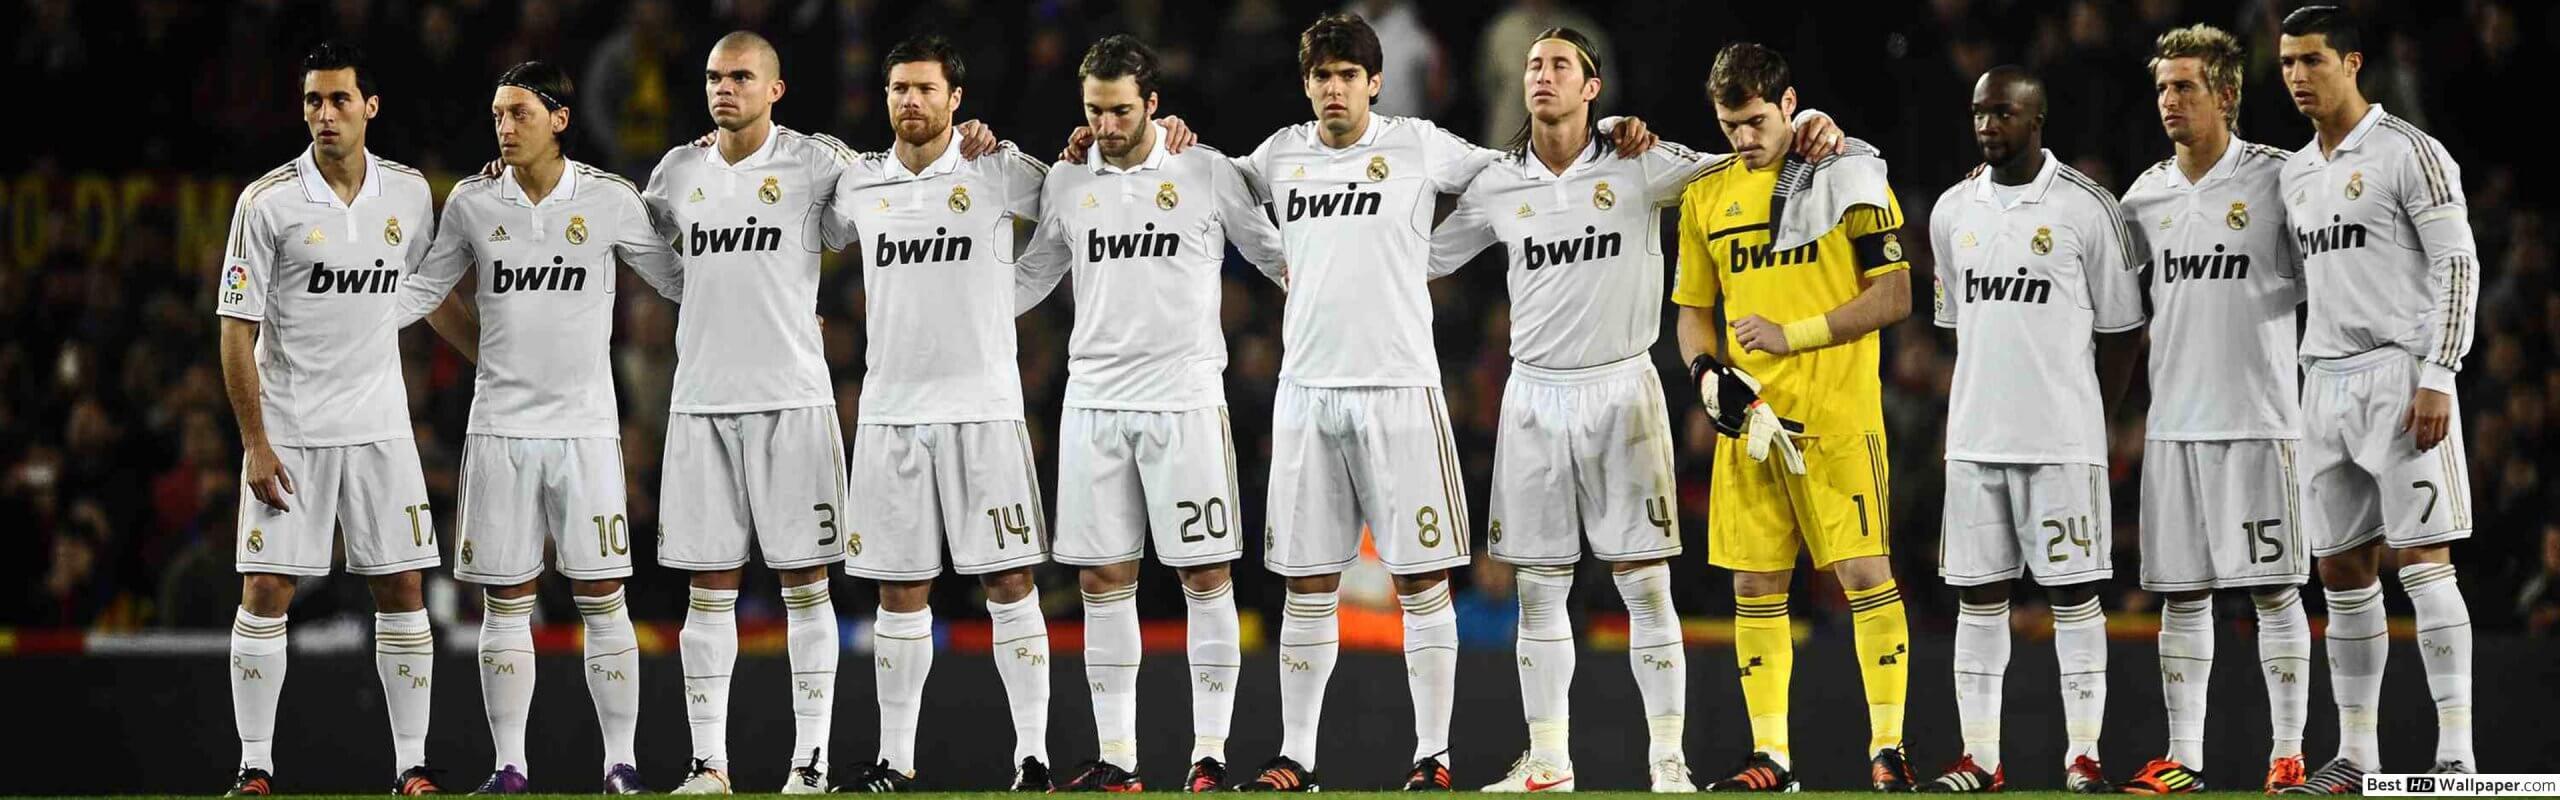 Bwin Real Madrid CS Casino